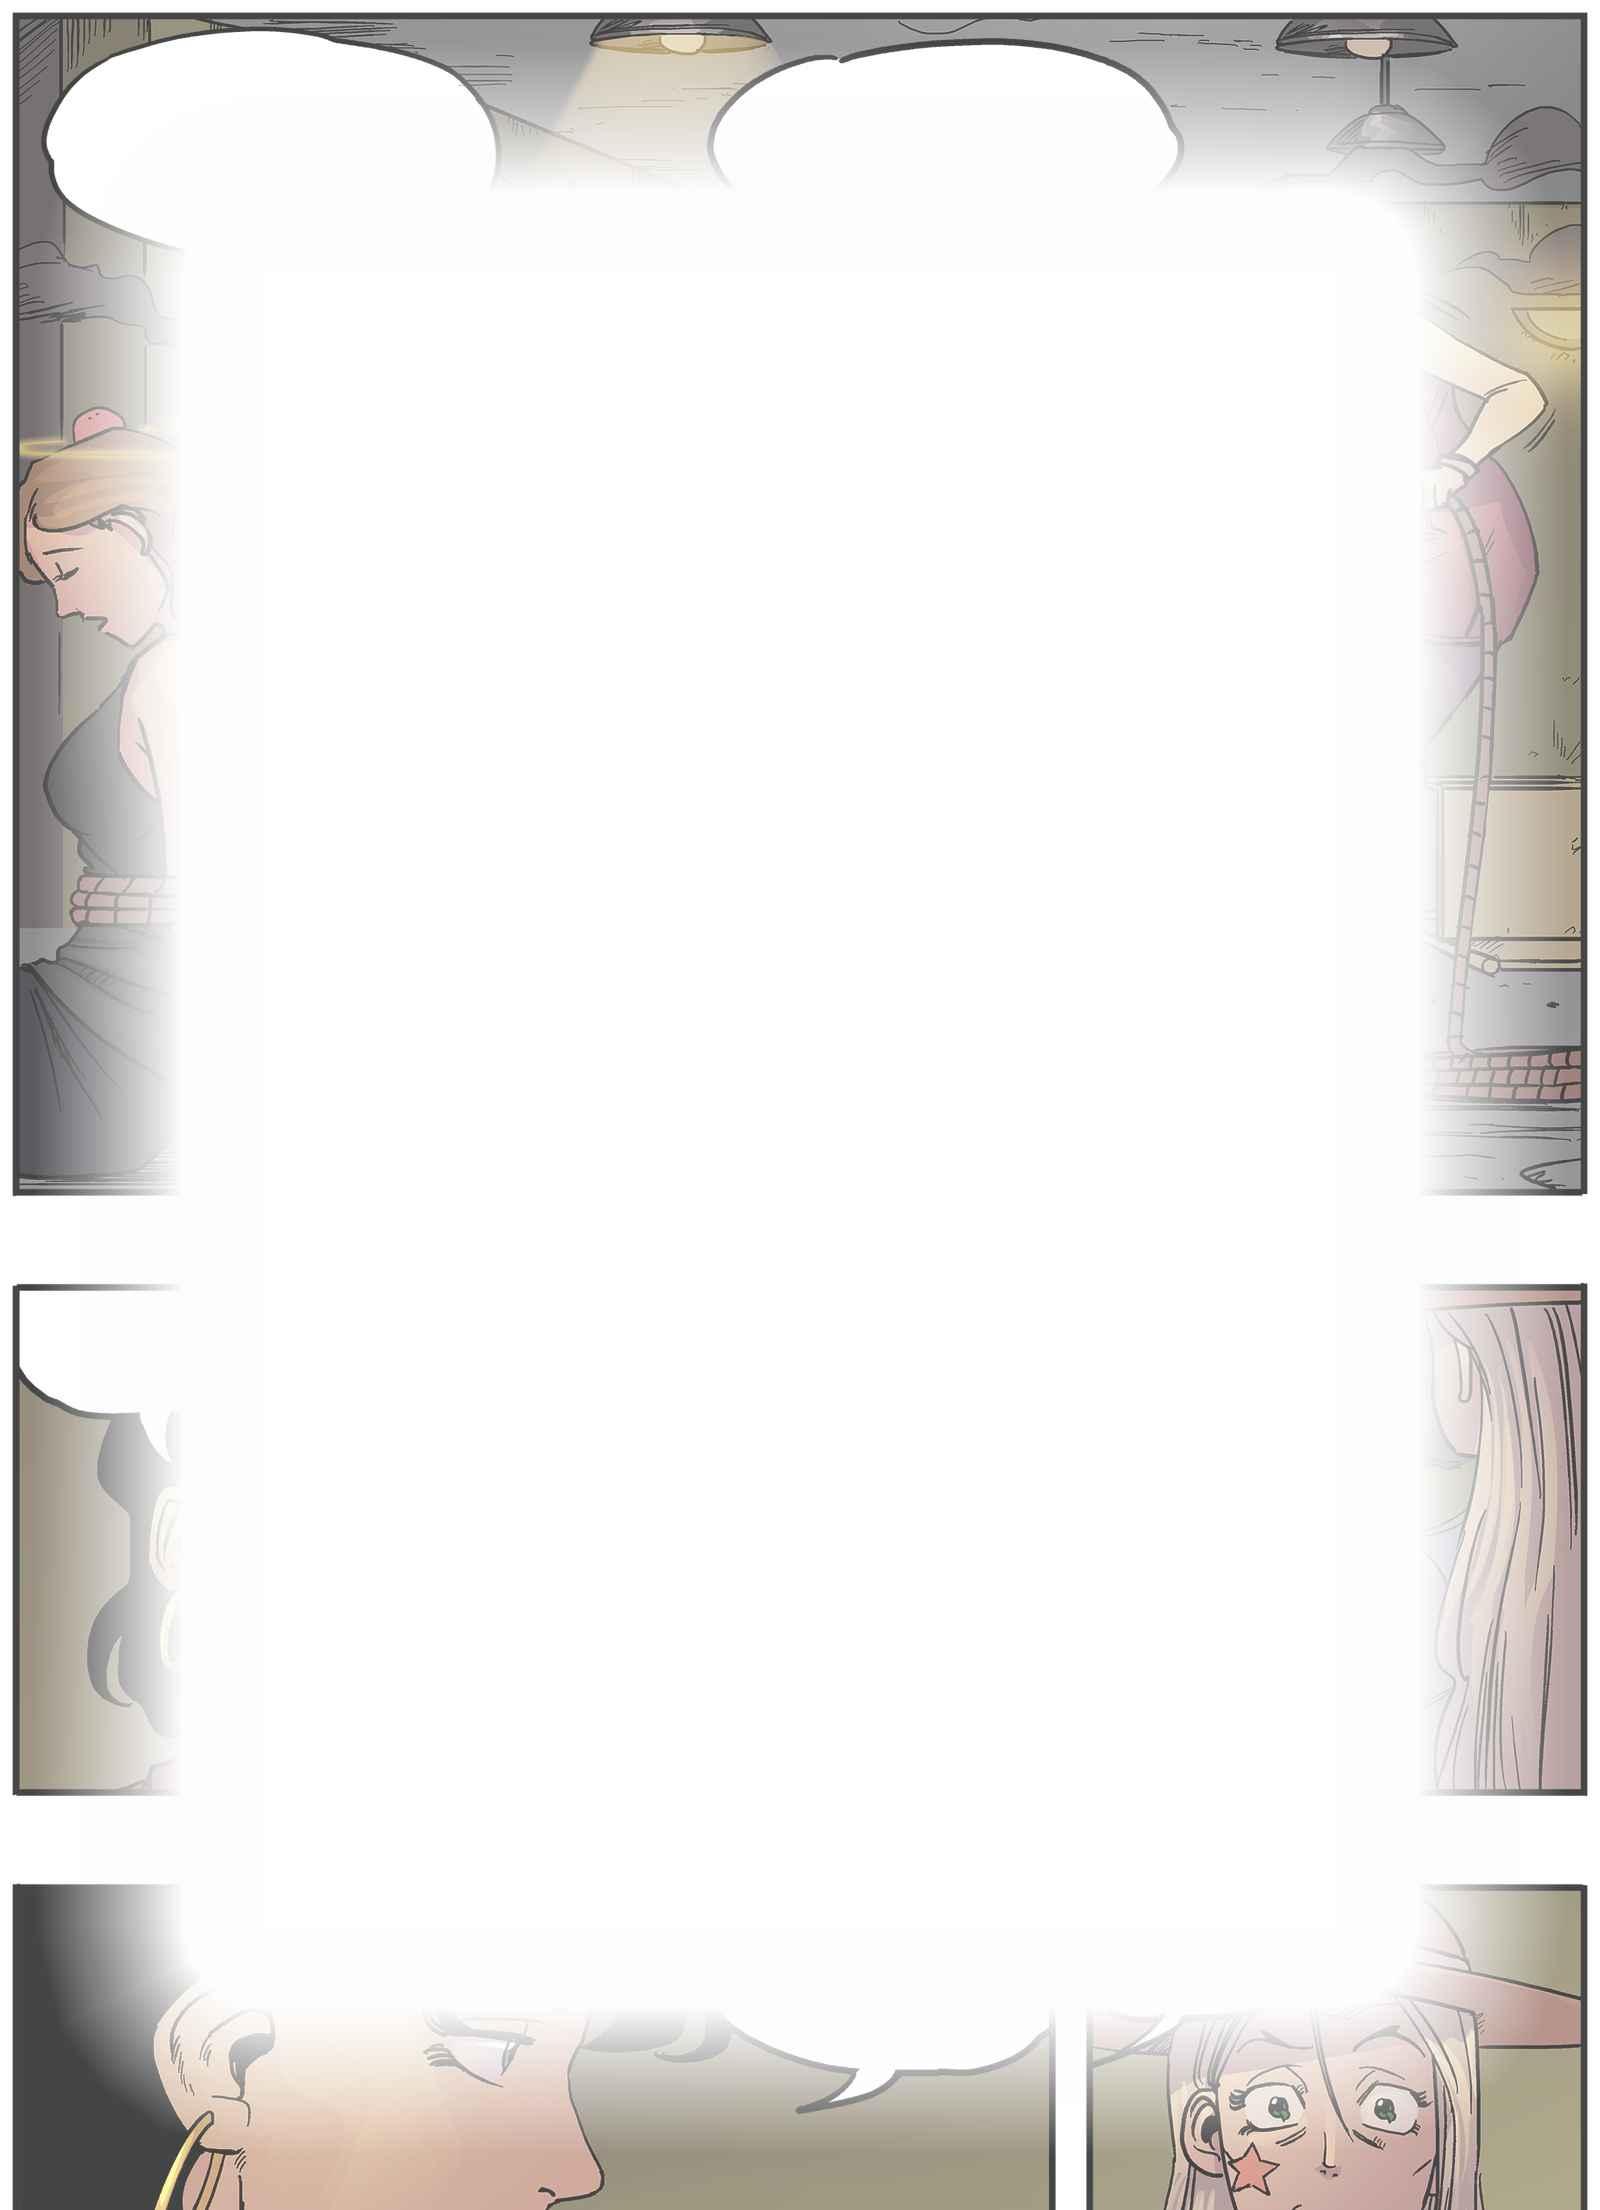 Amilova : Chapitre 5 page 18